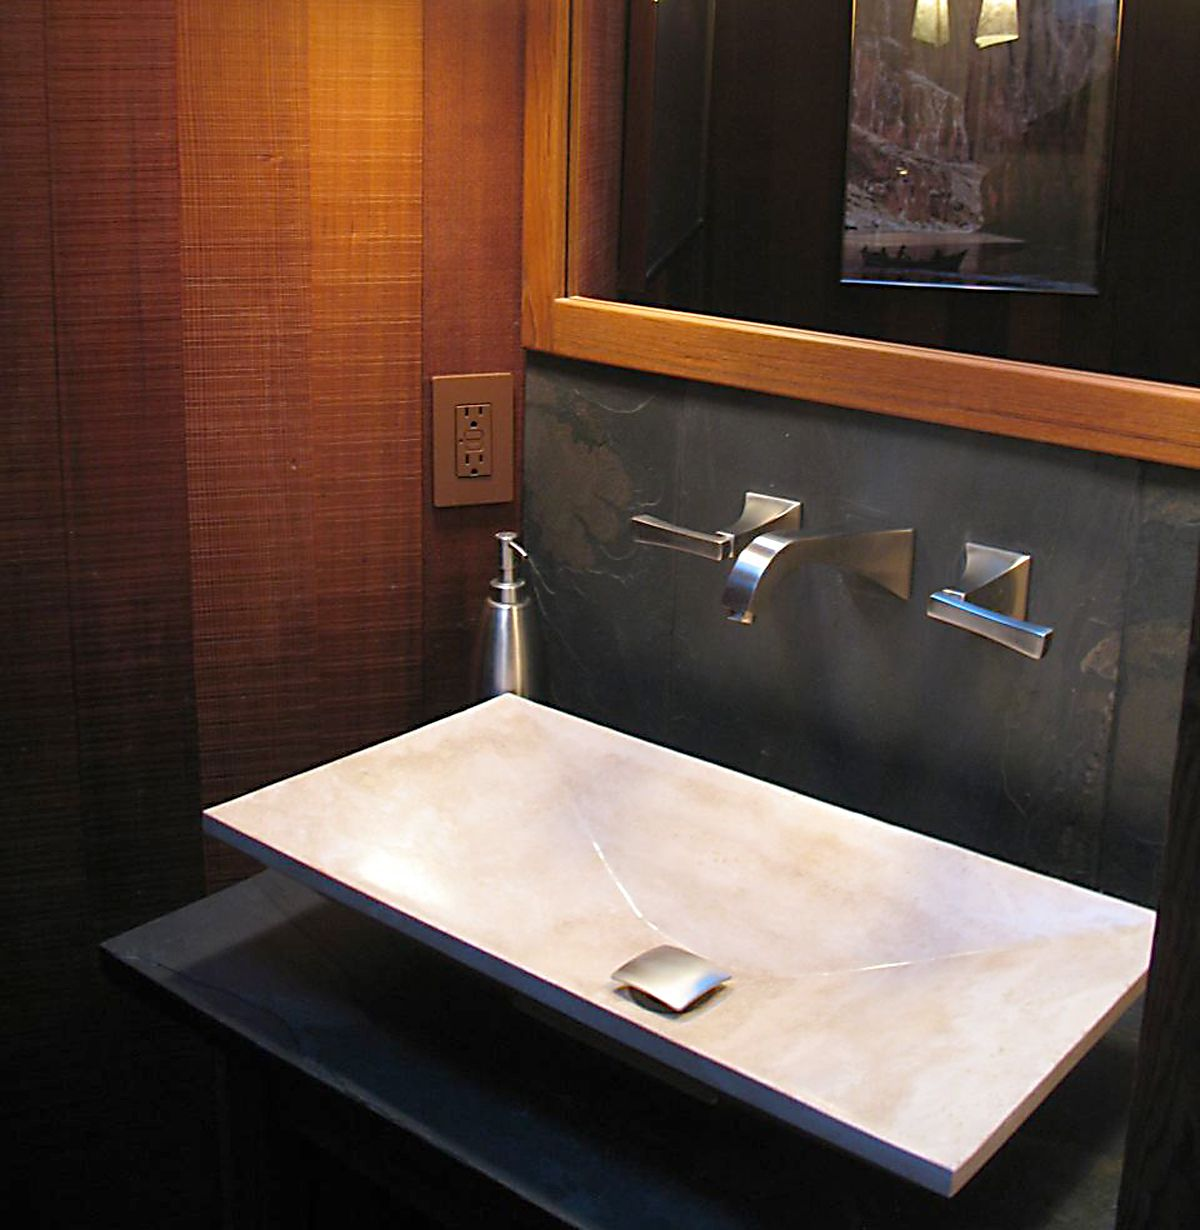 200 Best Restaurant Bathrooms Images On Pinterest: Restaurant Bathroom